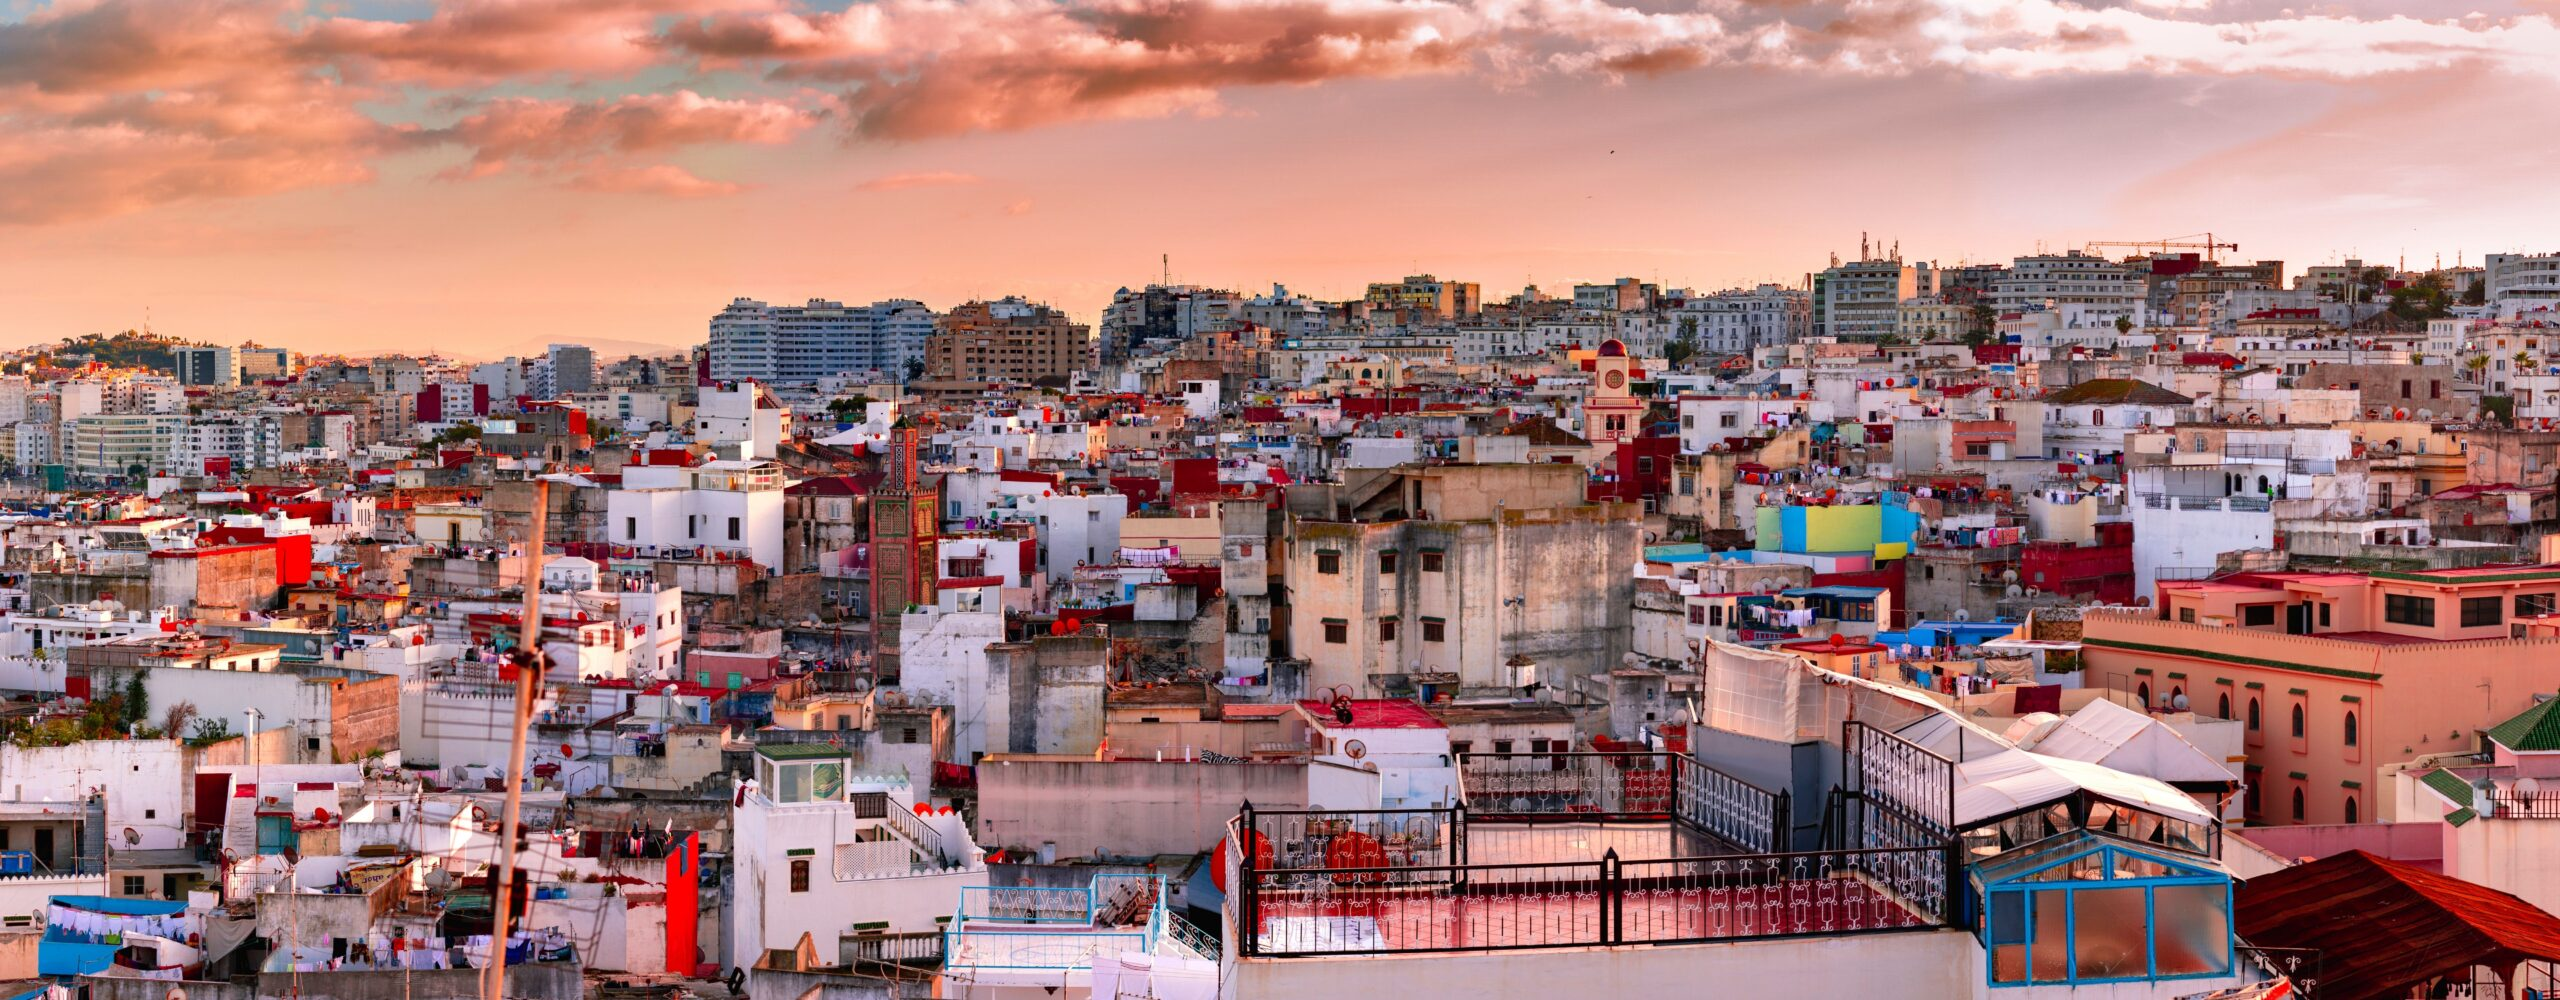 Africa safe destinations morocco